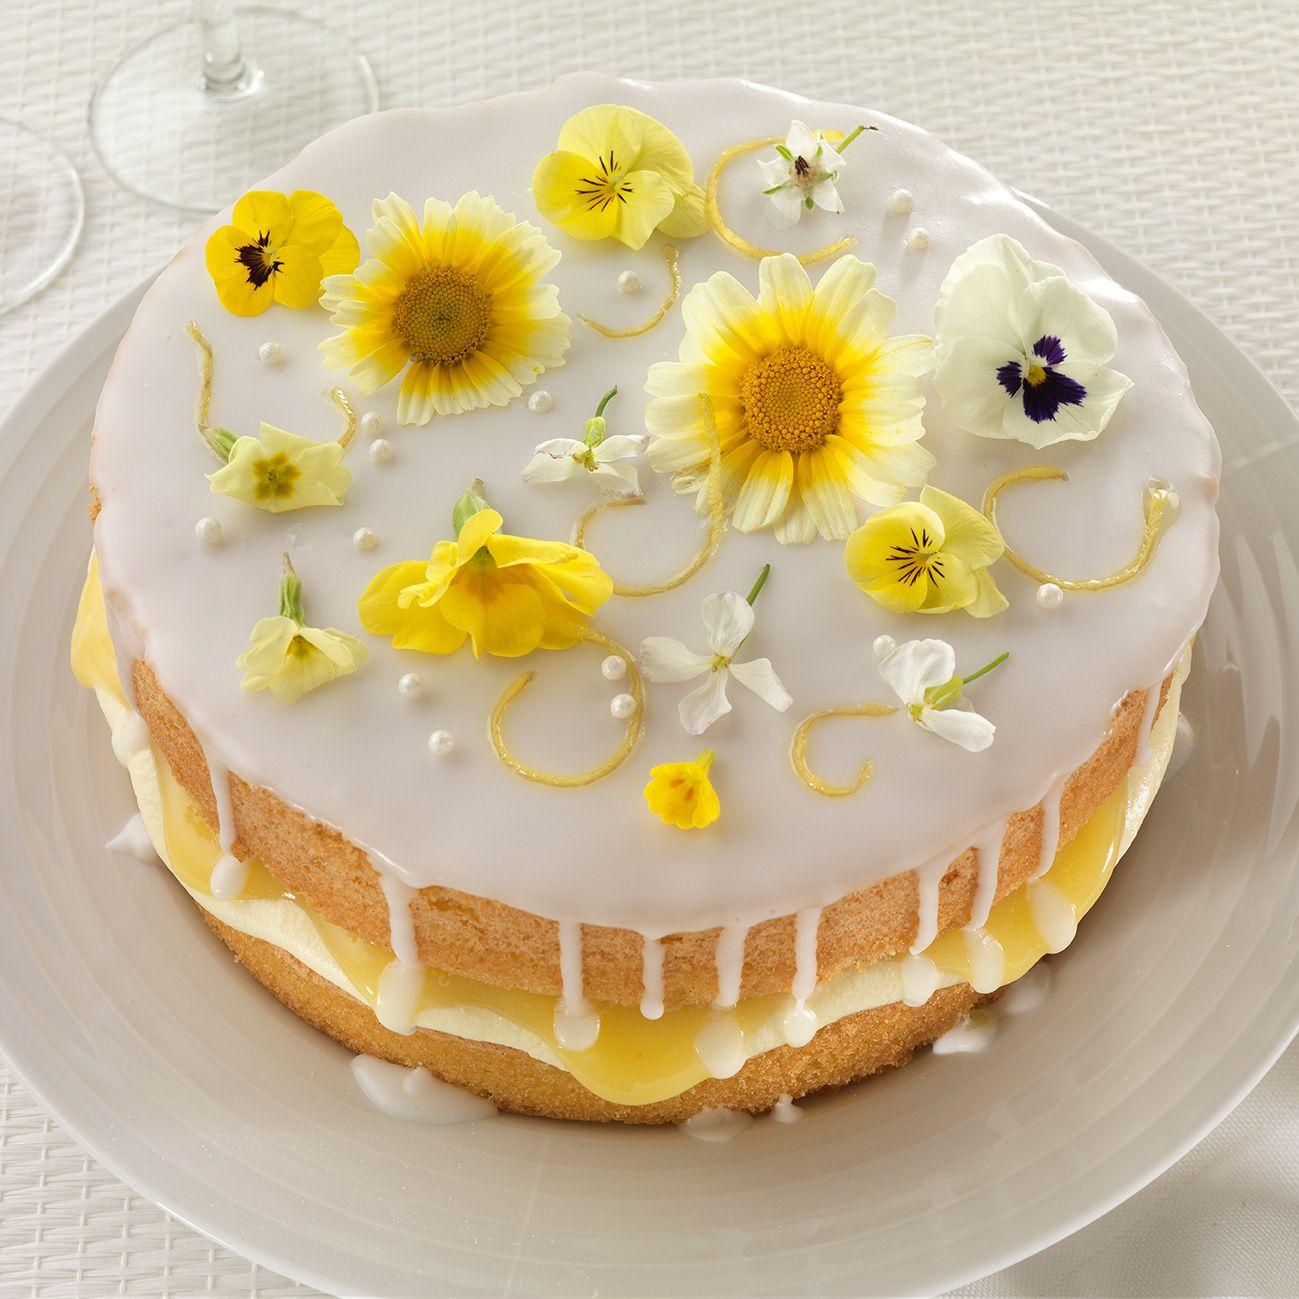 Lemon And Elderflower Drizzle Cake Recipe Food Glorious Food